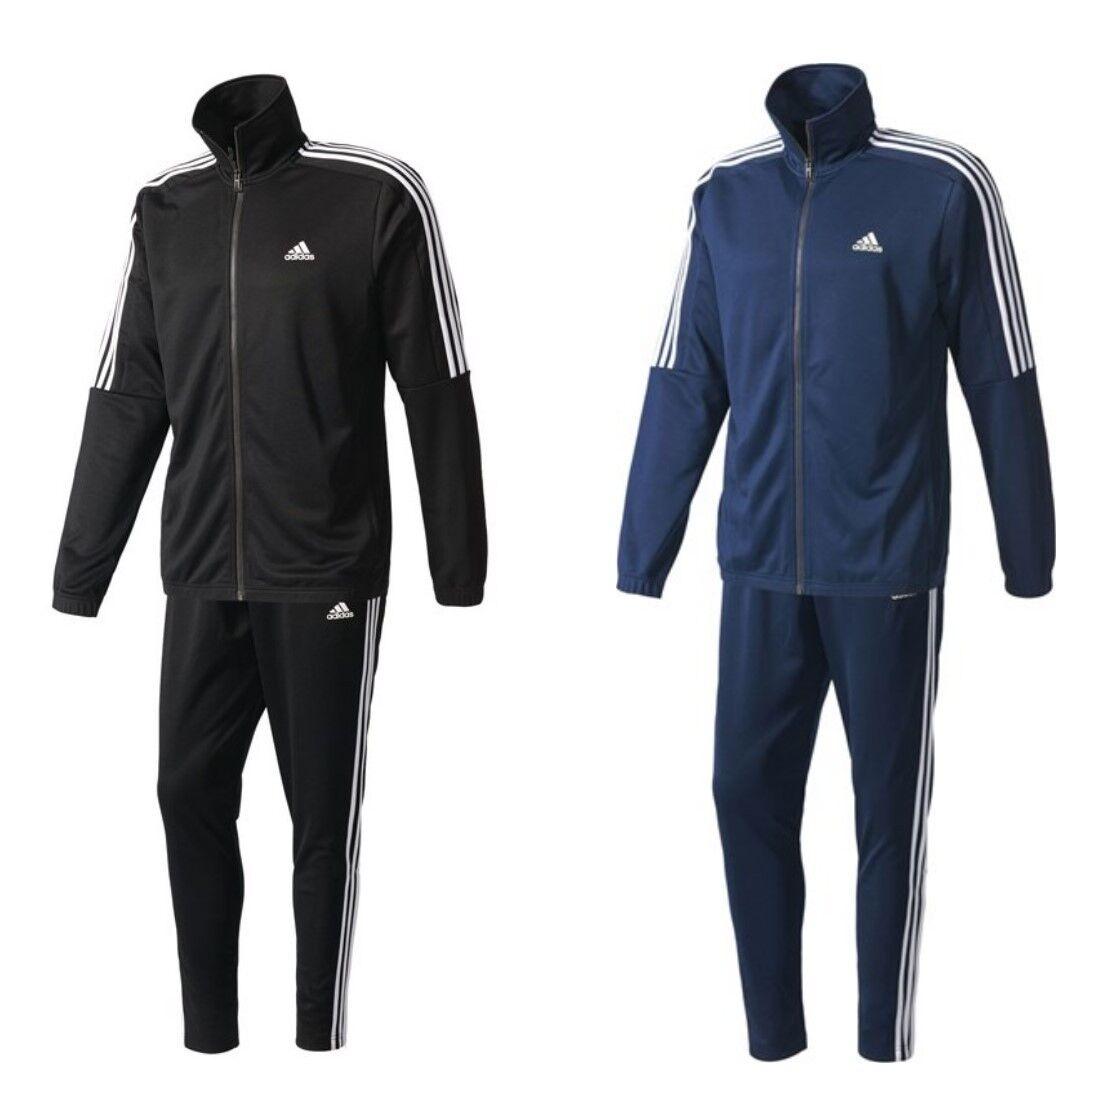 adidas Jogging Anzug Herren Männer Trainingsanzug Sportanzug schwarz blau S-XXL